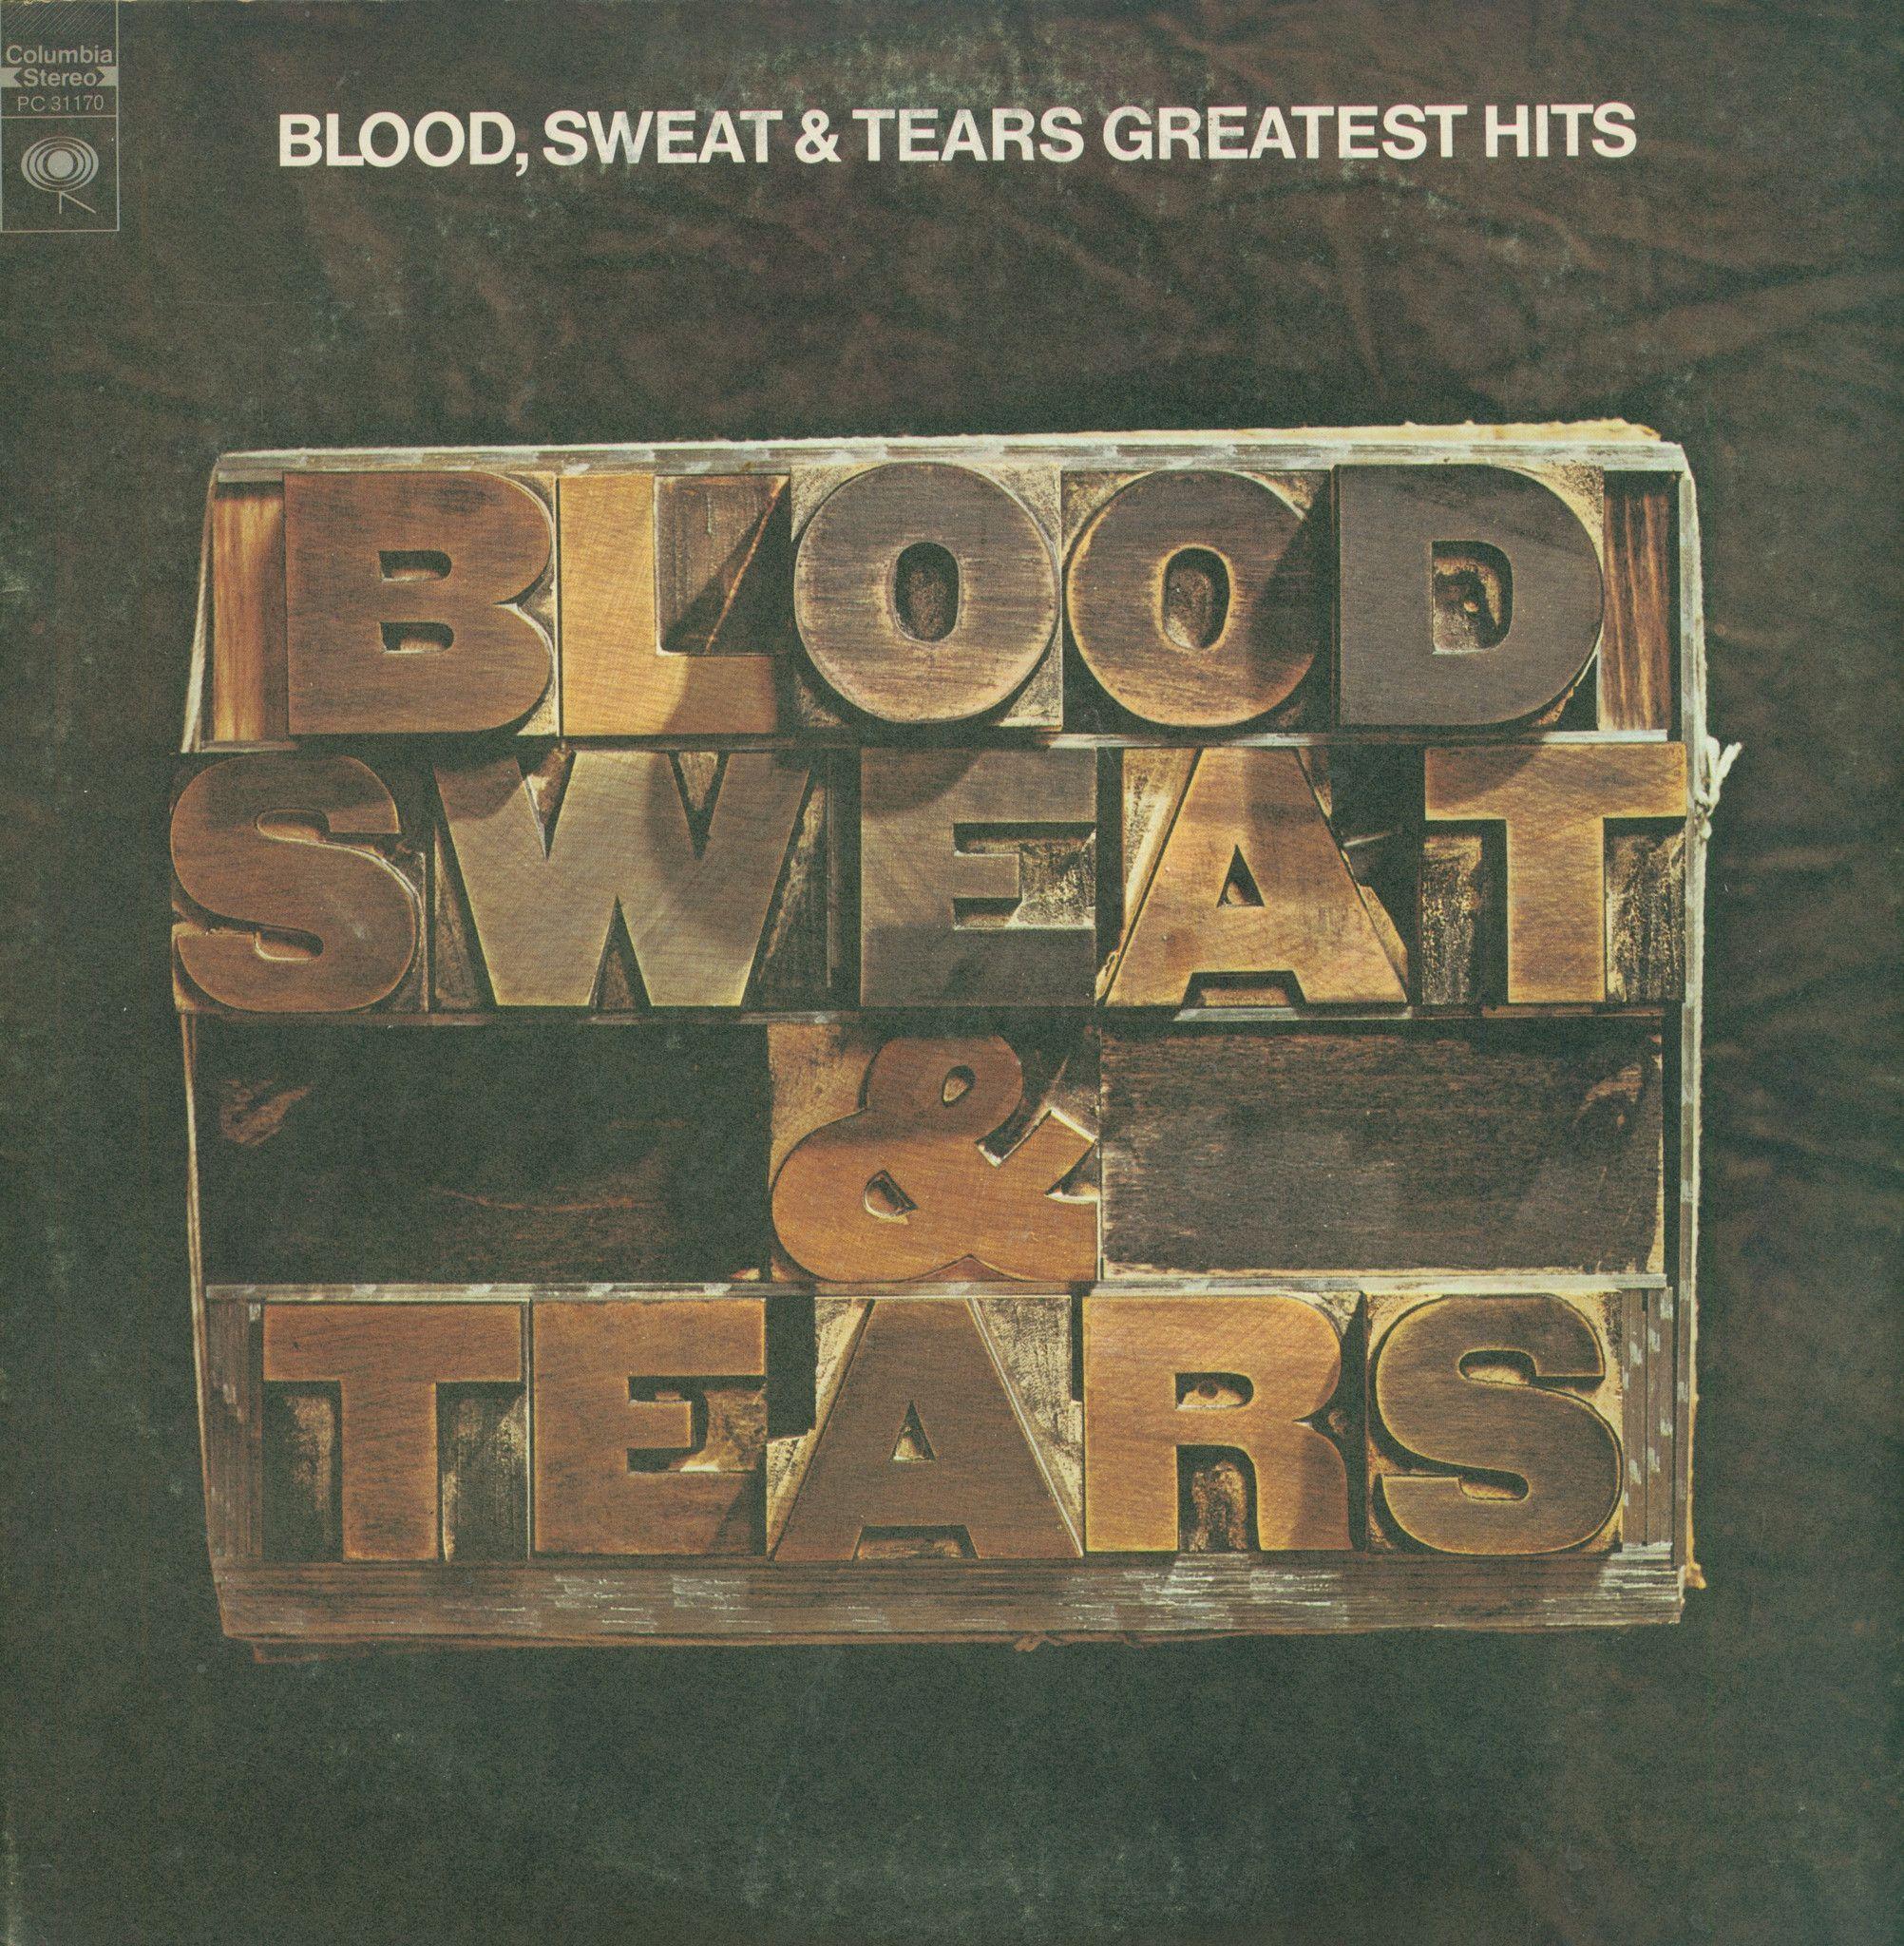 Blood Sweat Tears Greatest Hits Vinyl Lp Record Album Blood